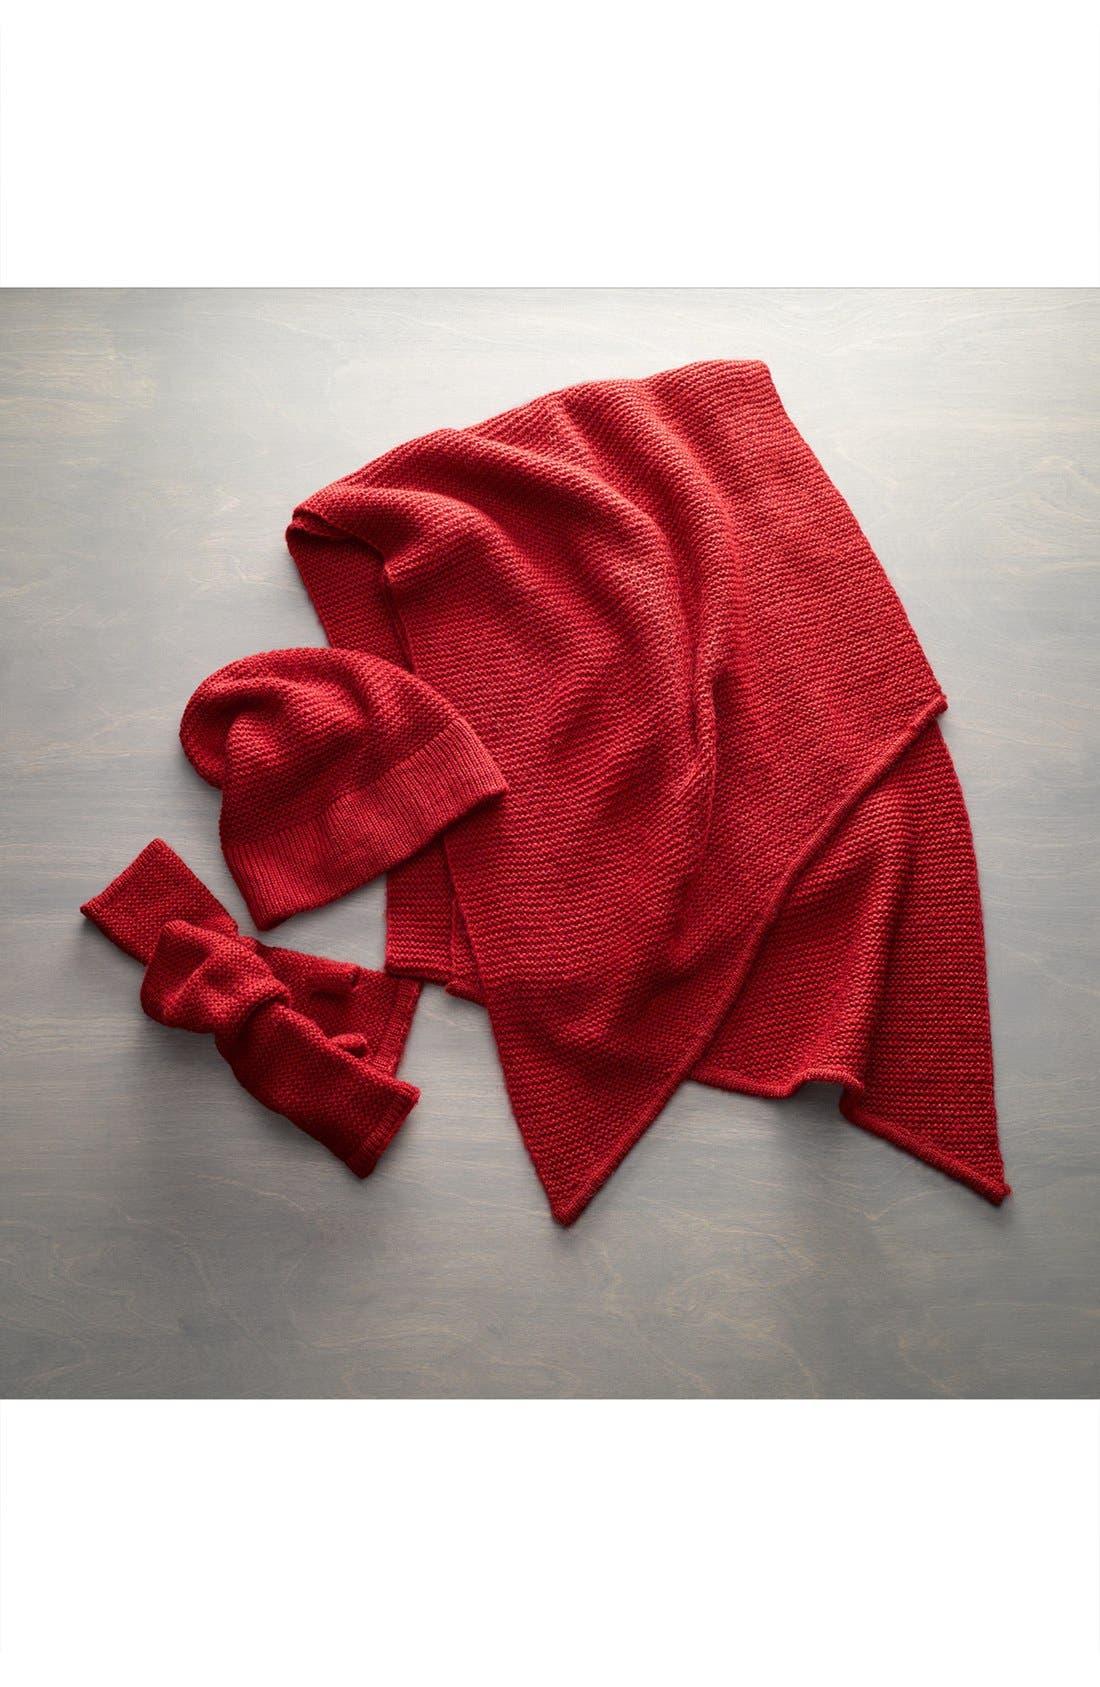 Garter Stitch Fingerless Gloves,                         Main,                         color, 021